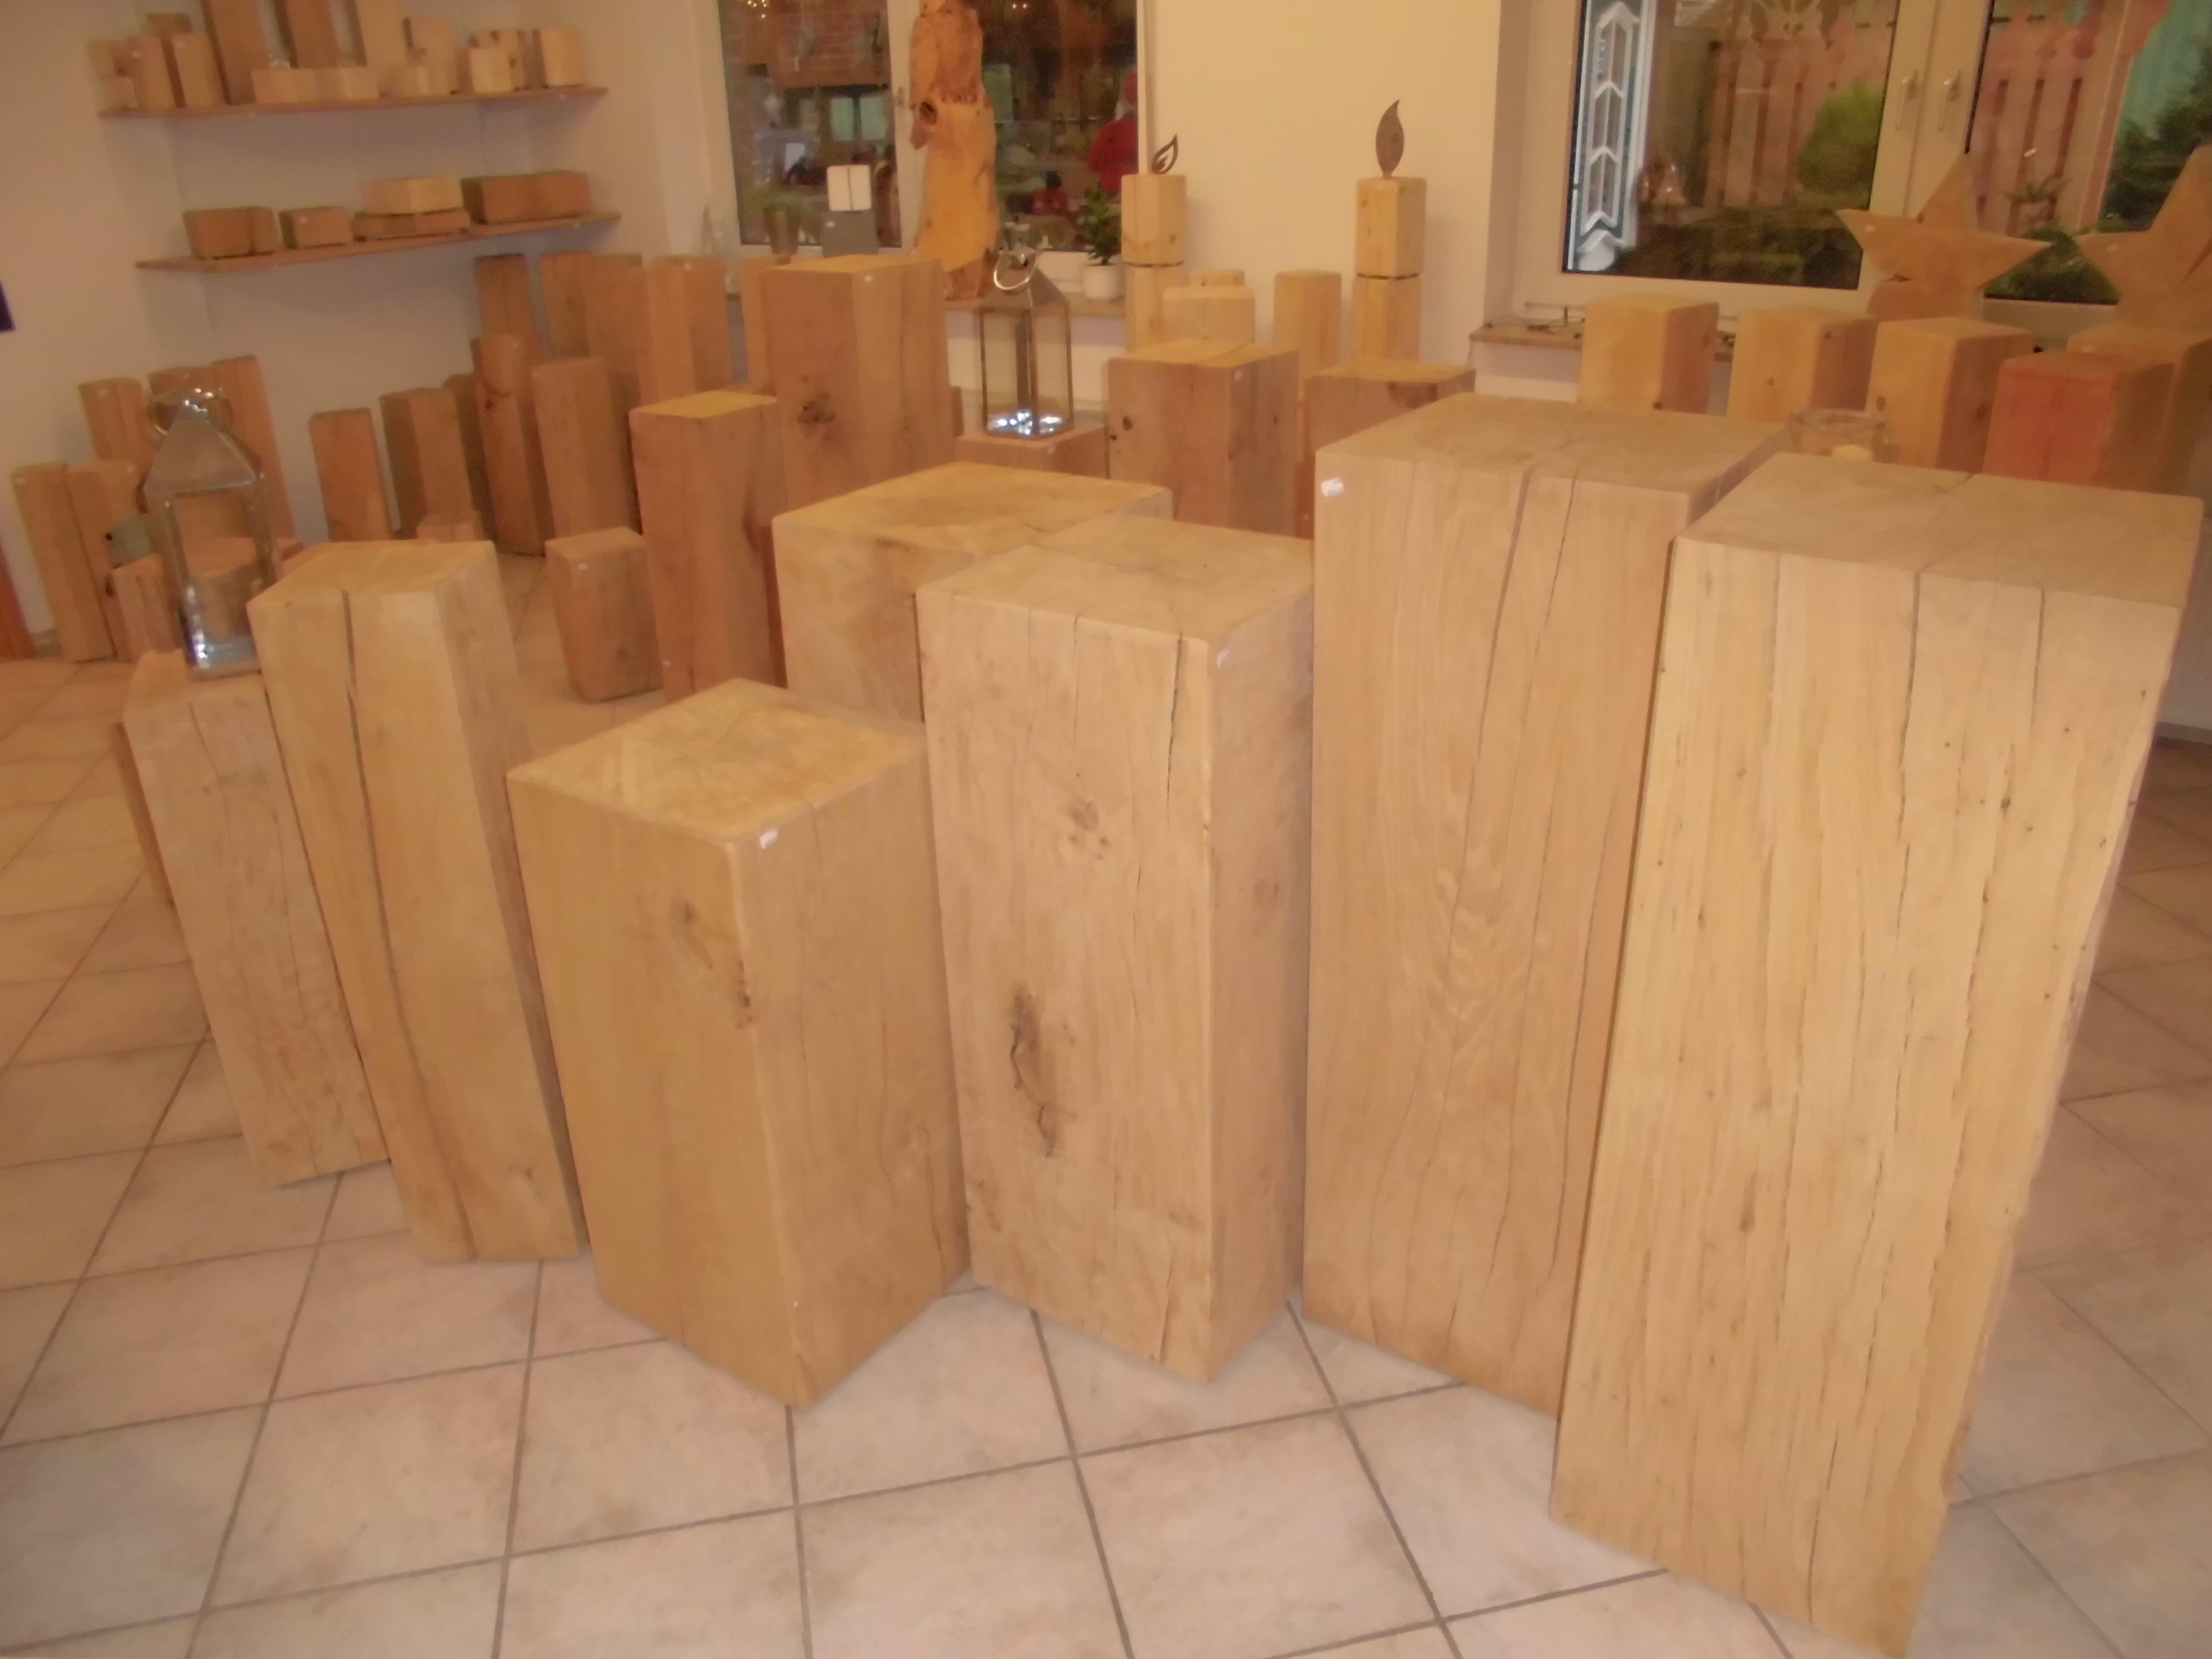 Eichenholzsäule gehobelt, geschliffen, angefast 20x20x80cm